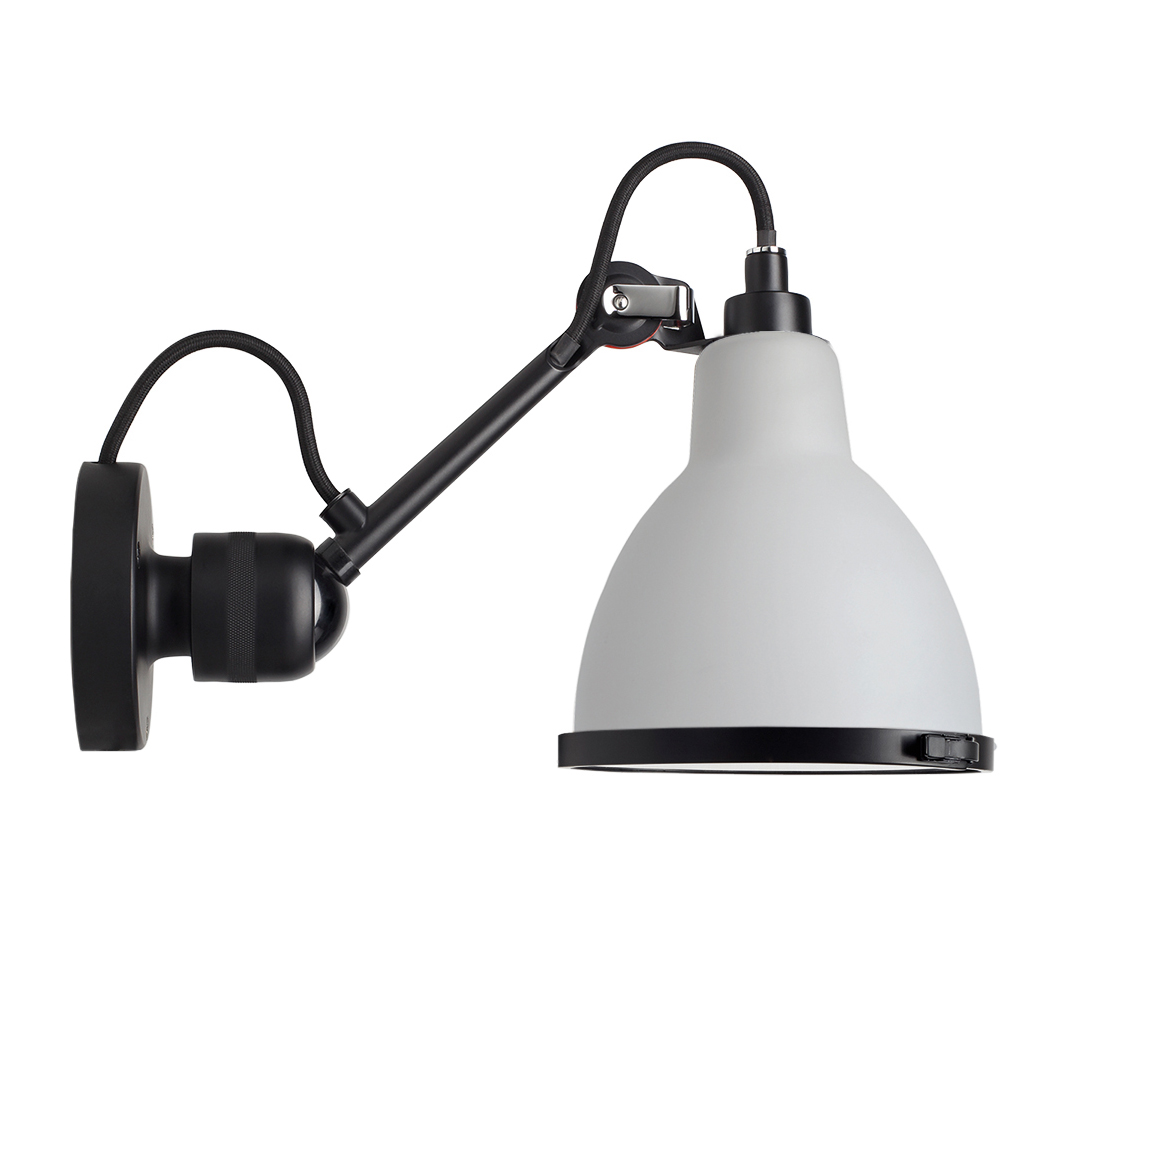 N304 Baderomslampe Svart/Frostet